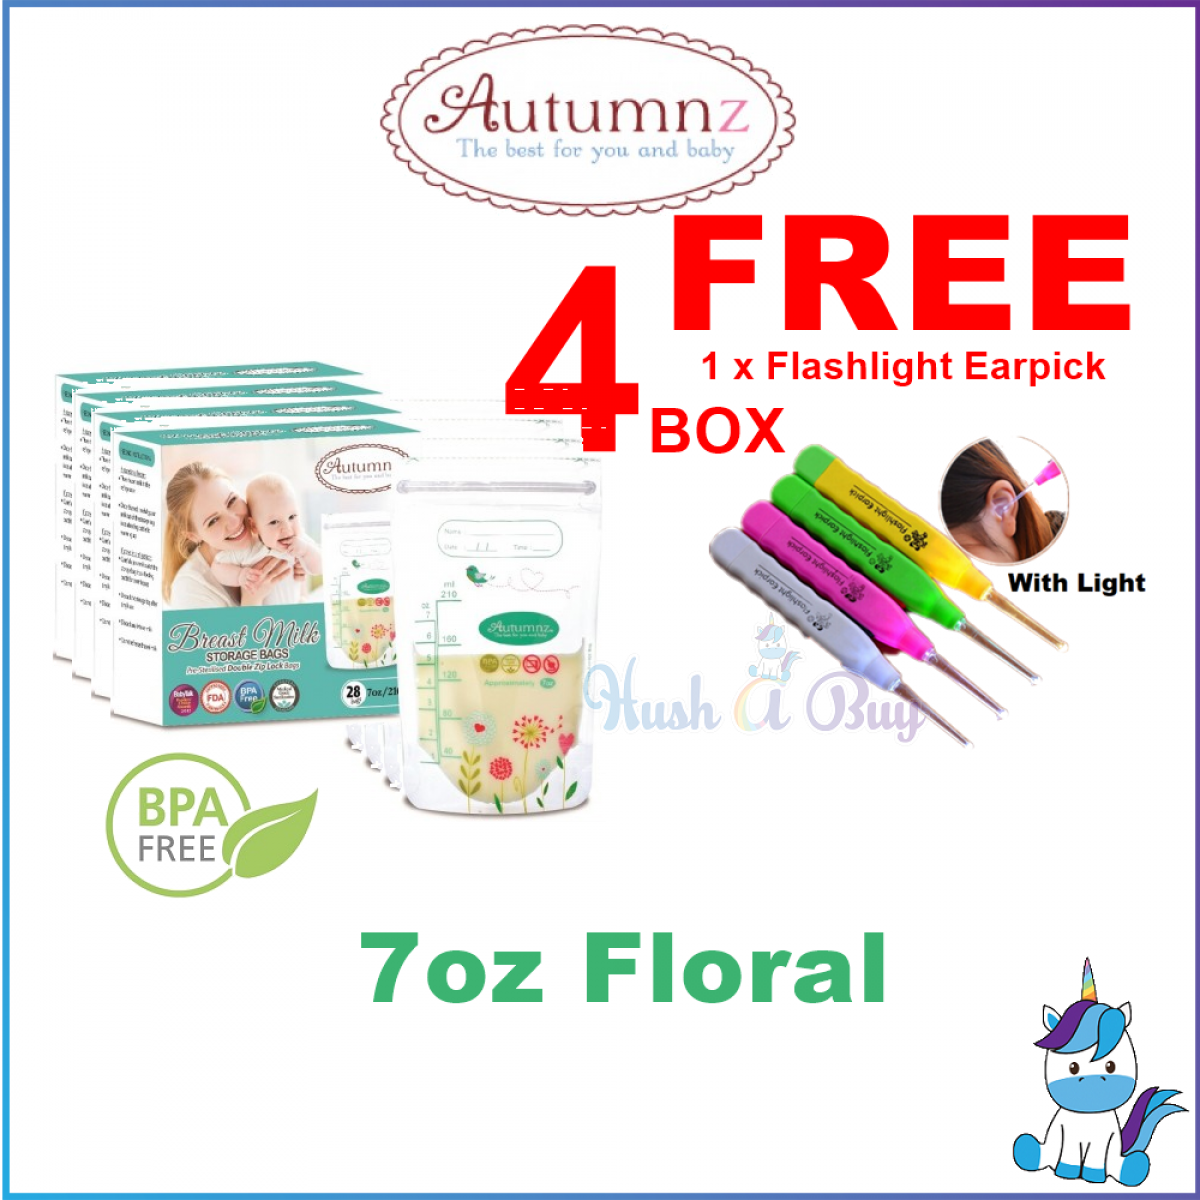 4 BOXES - Autumnz Double ZipLock Breastmilk Breast Milk Storage Bag / Bag Susu (28 Bags) 5oz / 7oz / 10oz / 12oz - FREE LED FLASHLIGHT EARPICK